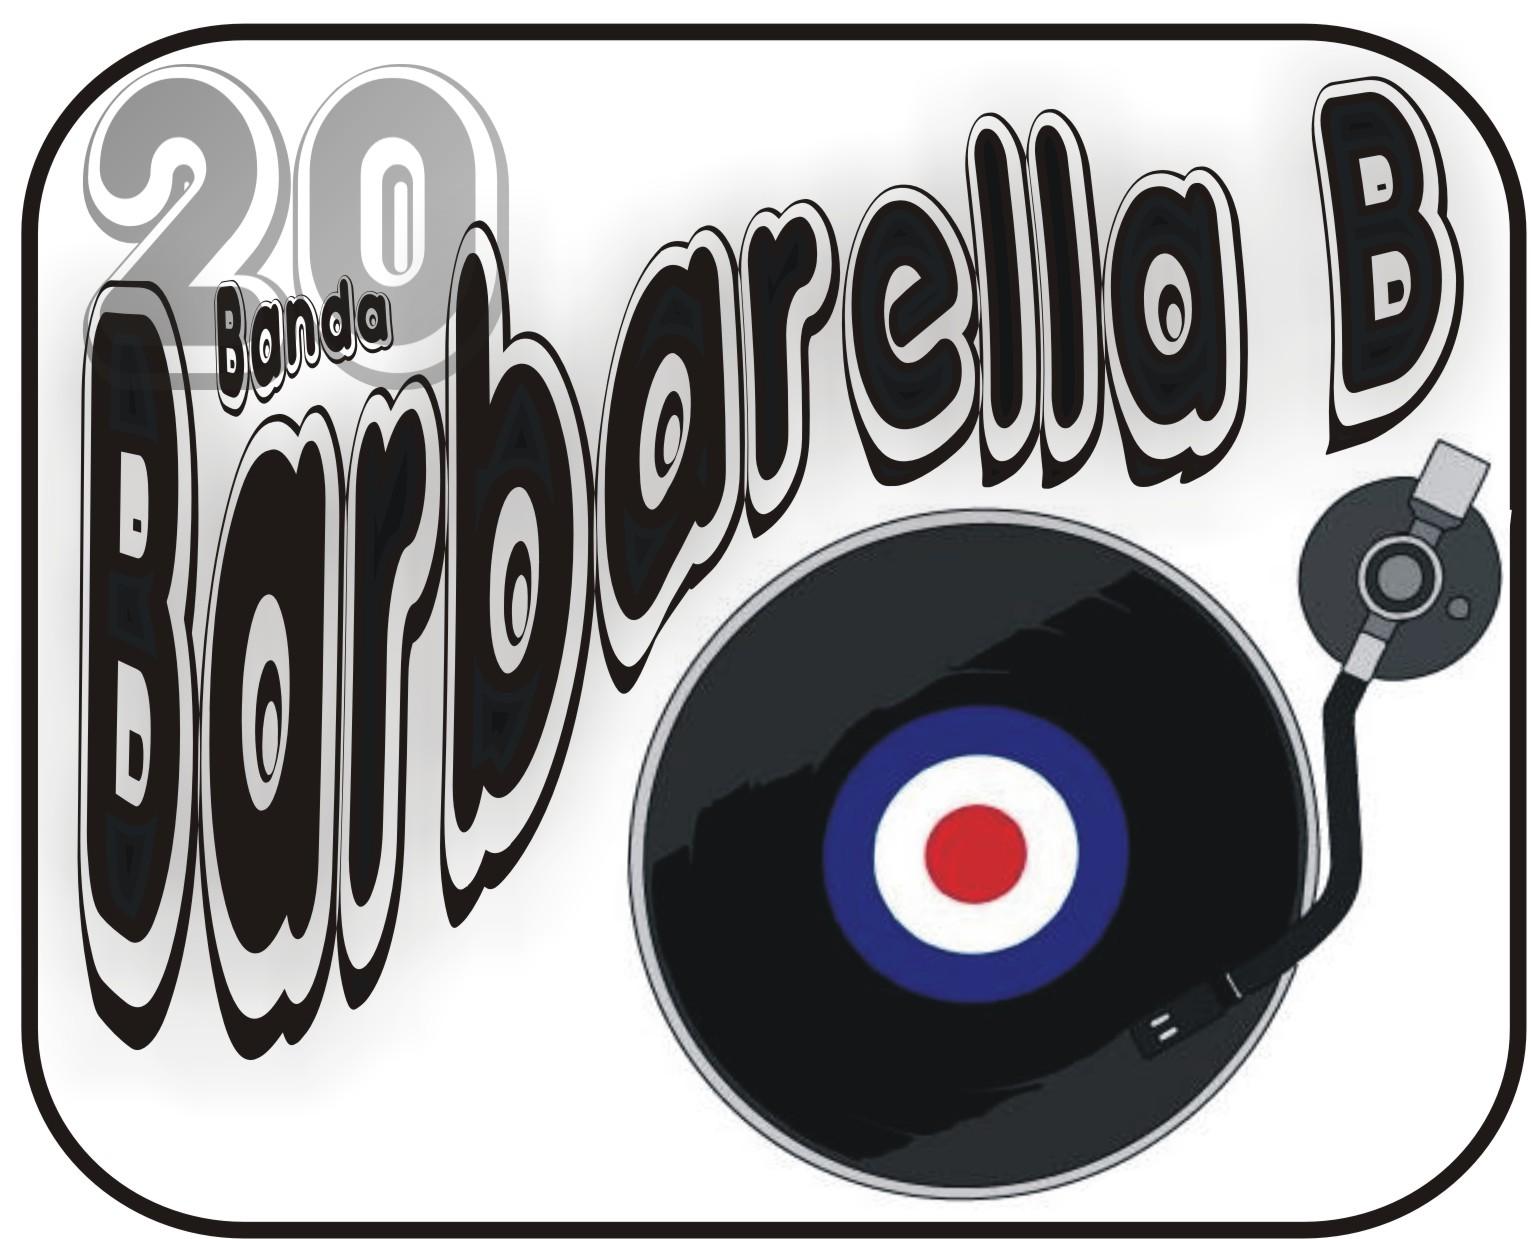 BANDA BARBARELLA B